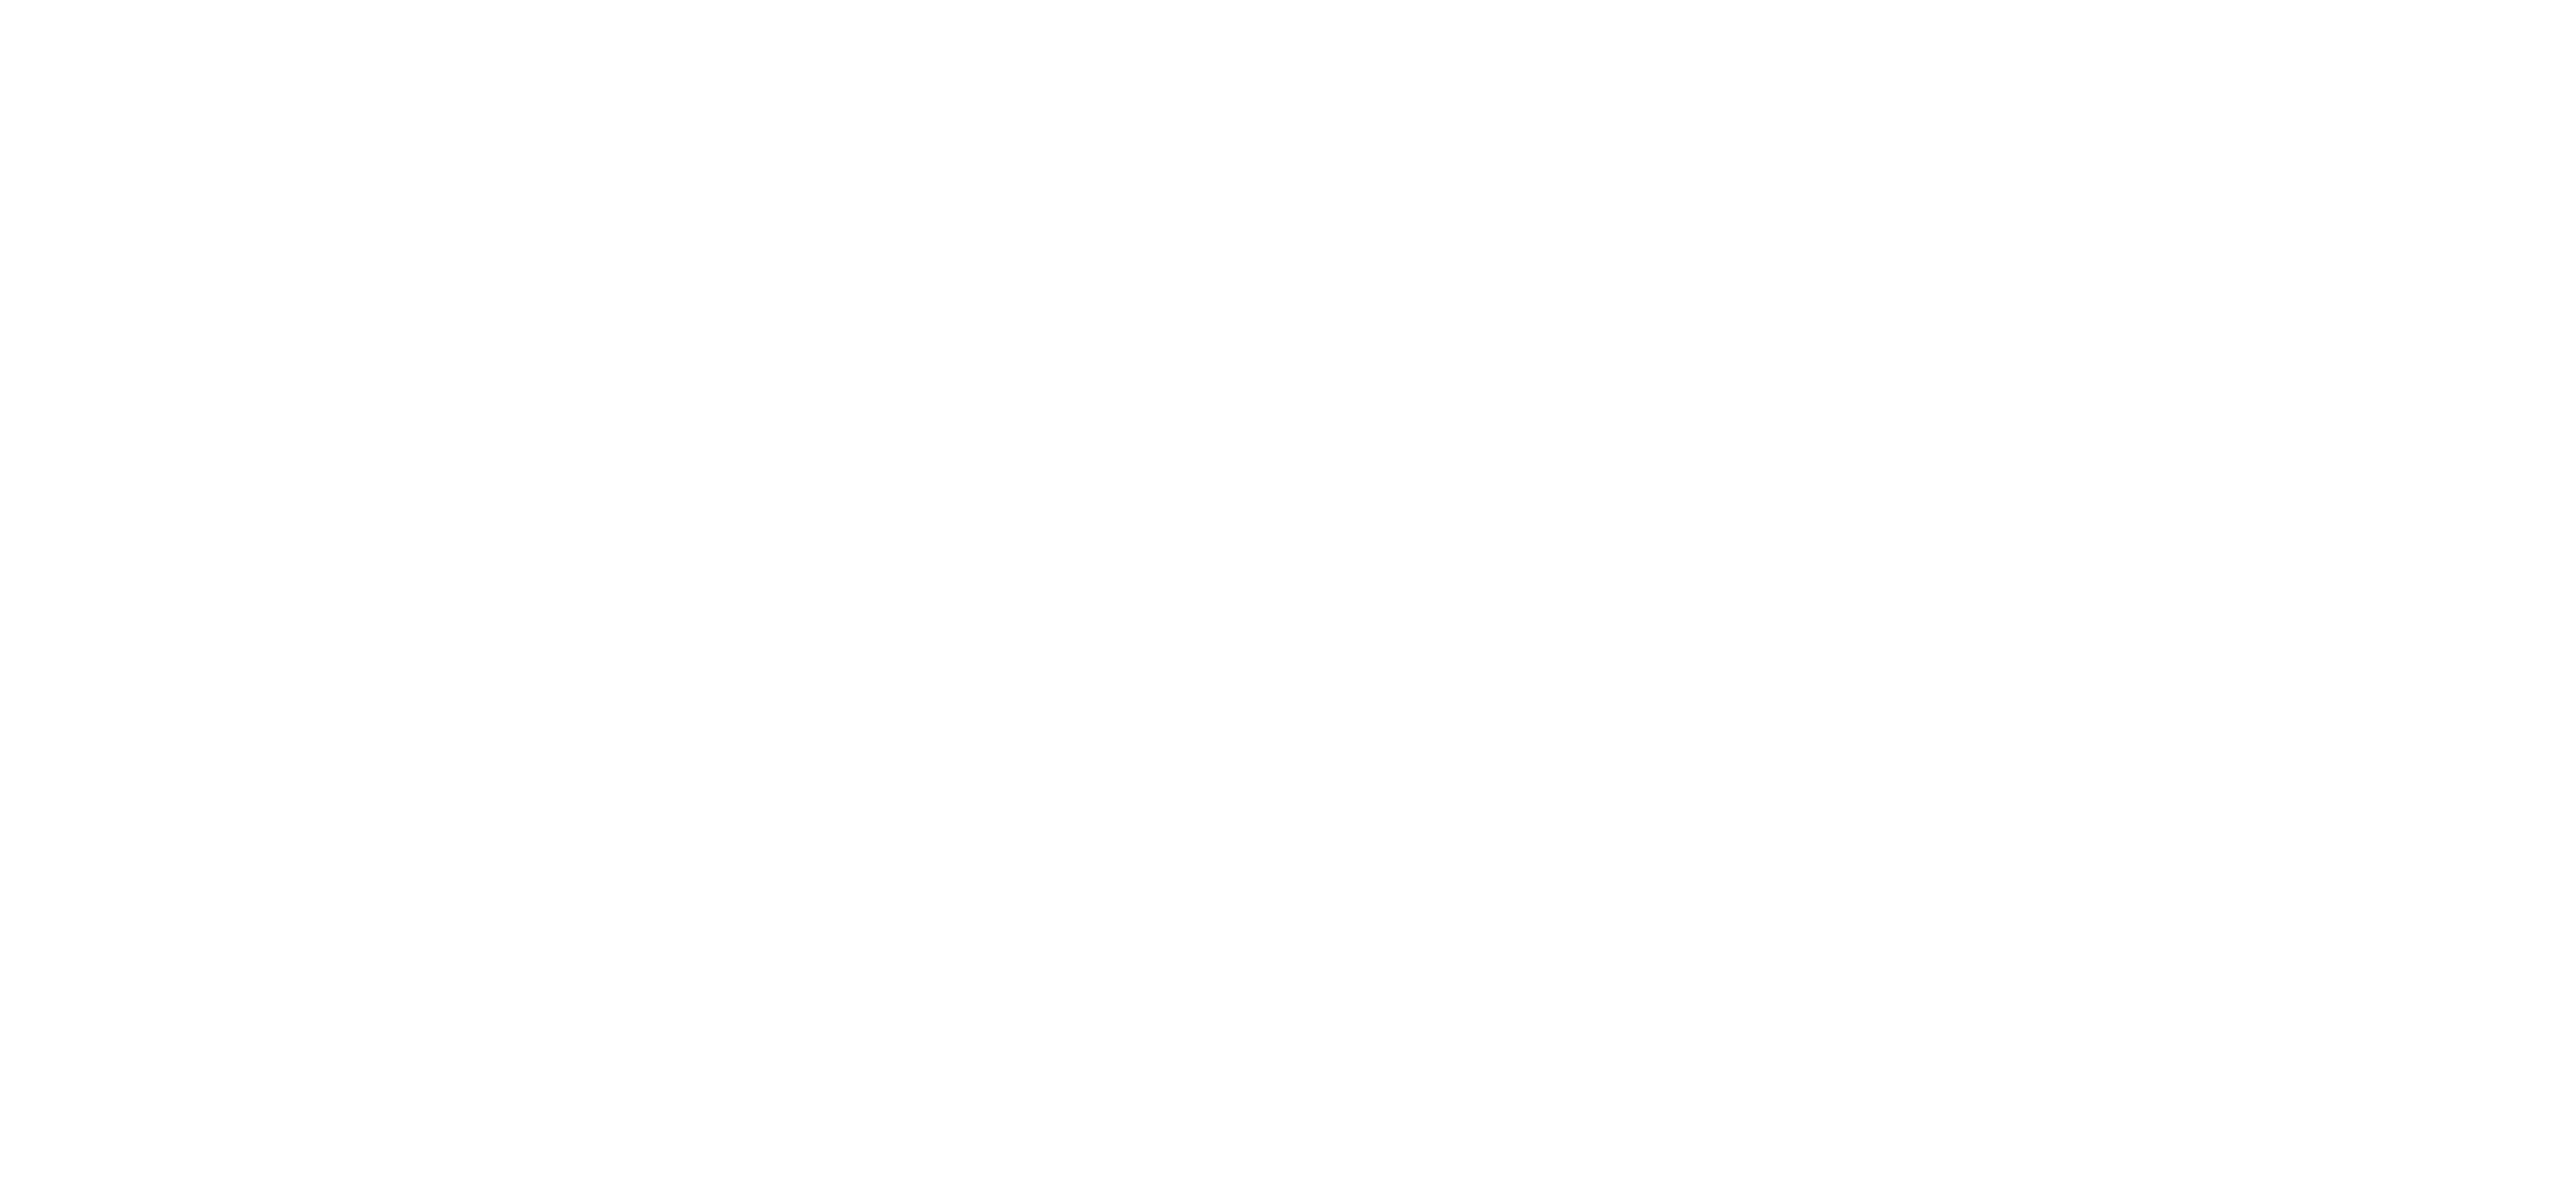 Afrasia s1